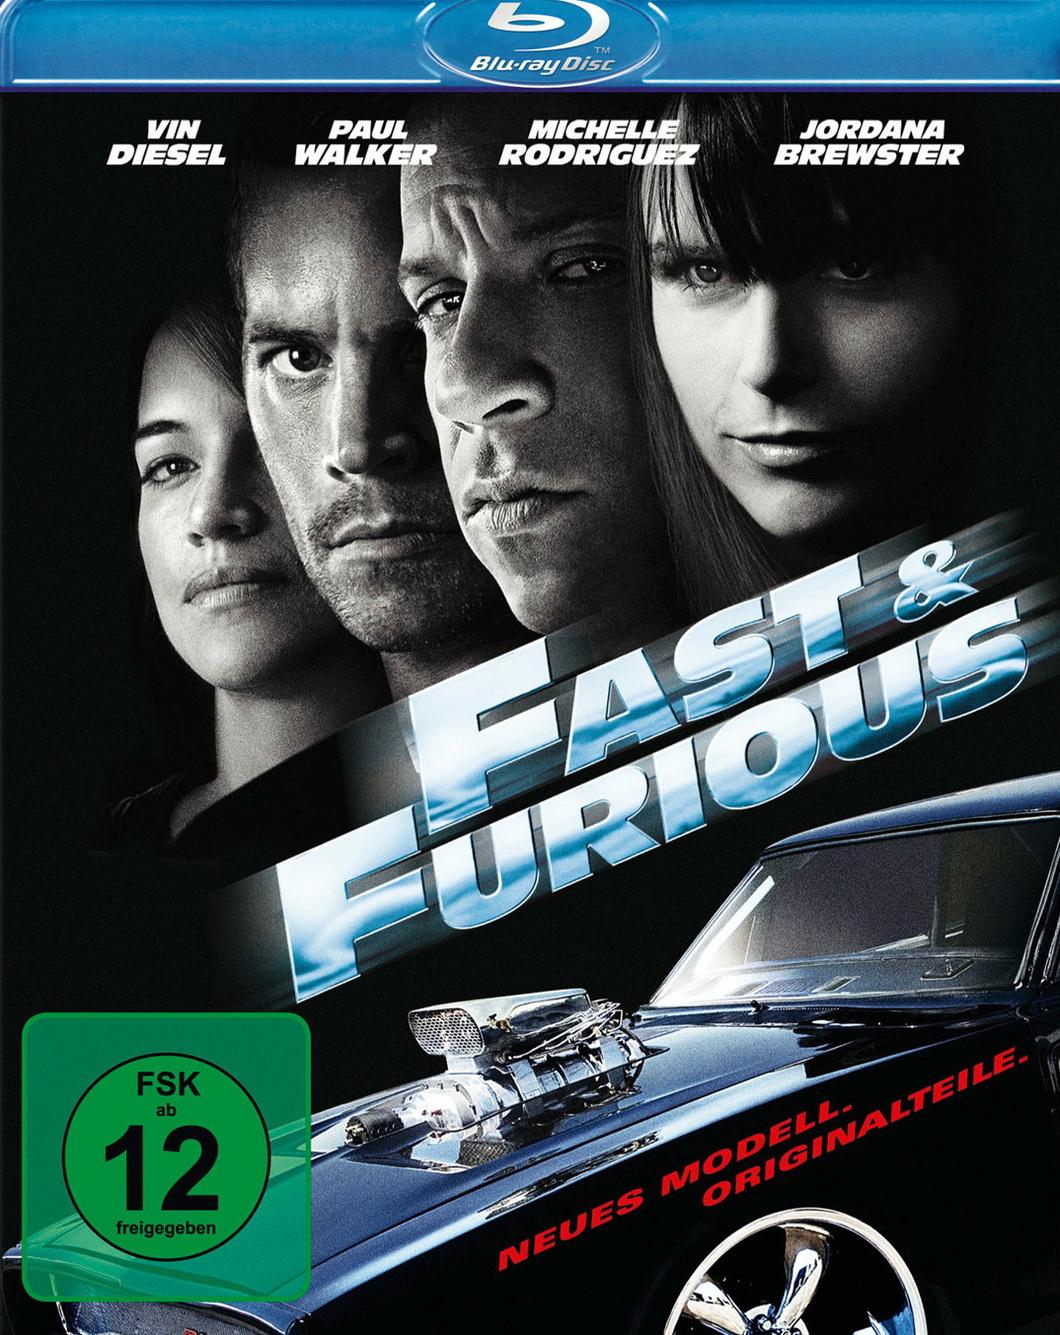 Fast & Furious 4 - Neues Modell. Originalteile.